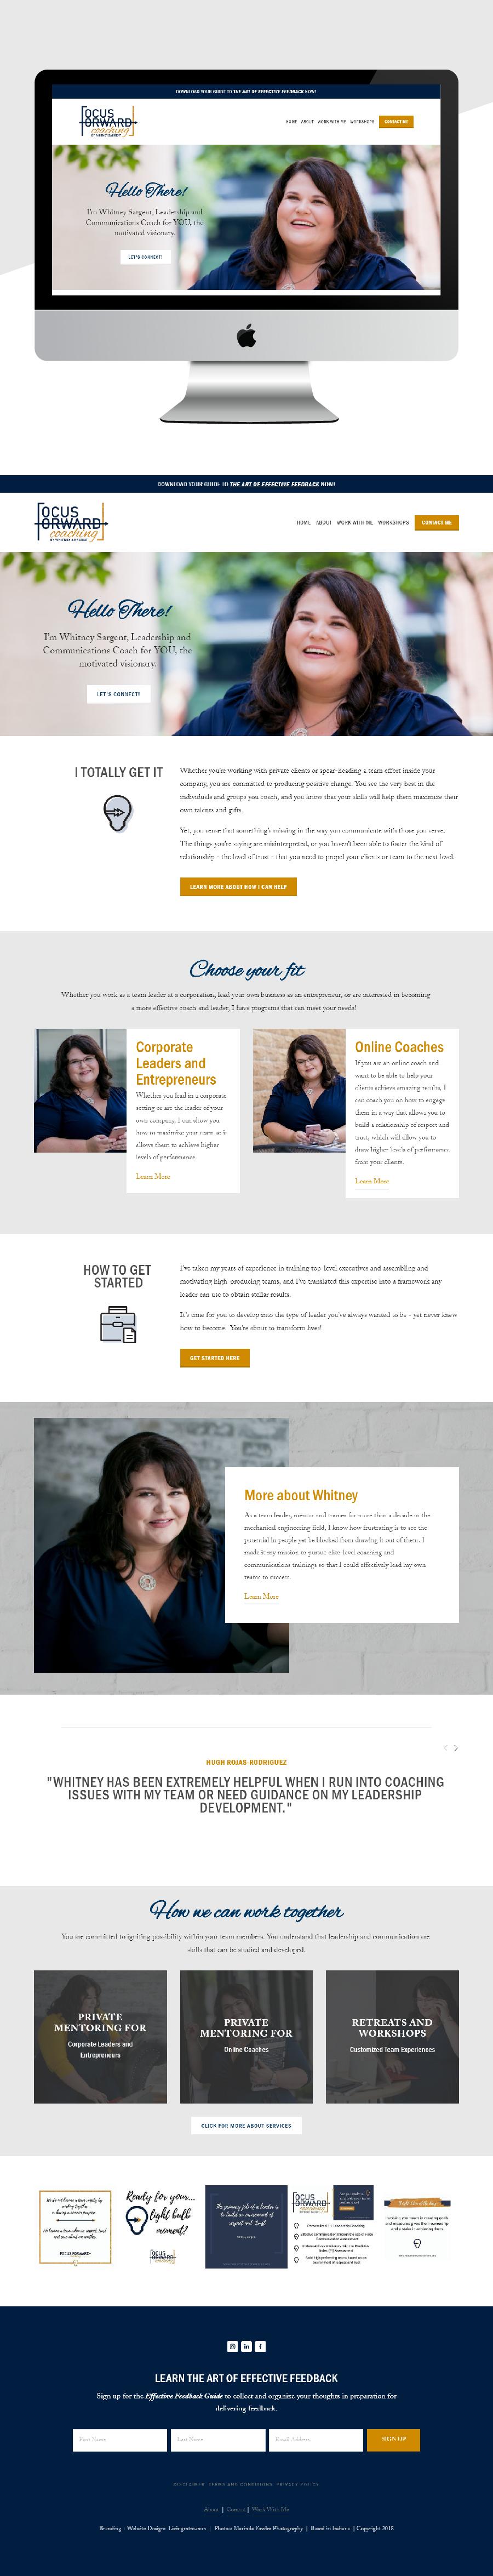 Focus-Forward-Coaching-Whitney-Sargent-Leadership.jpg